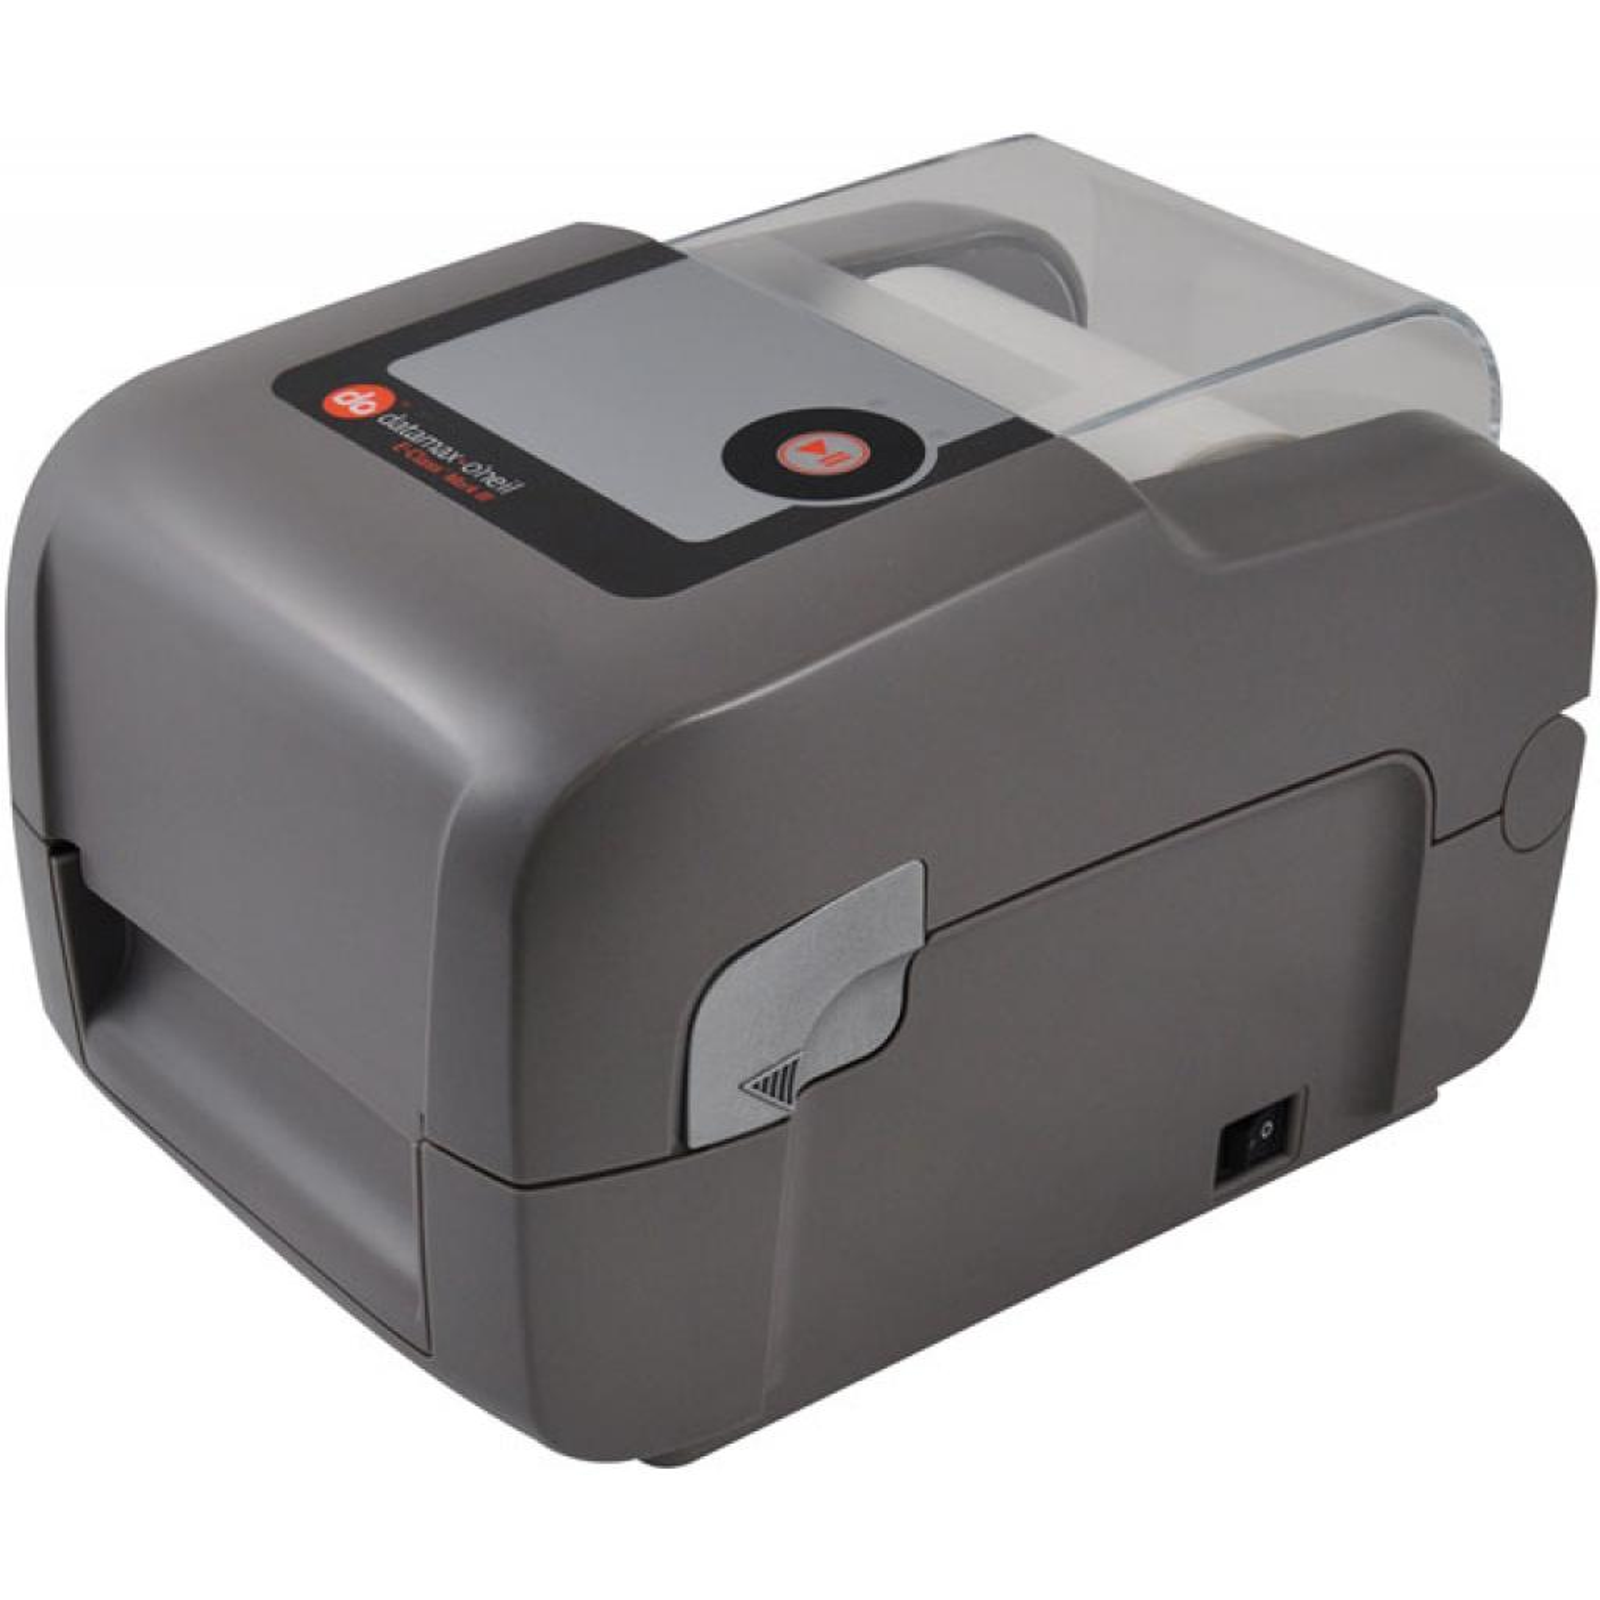 Принтер этикеток Datamax-O'neil E-Class Mark III E-4204B, 203dpi (EB2-00-1E000B00)